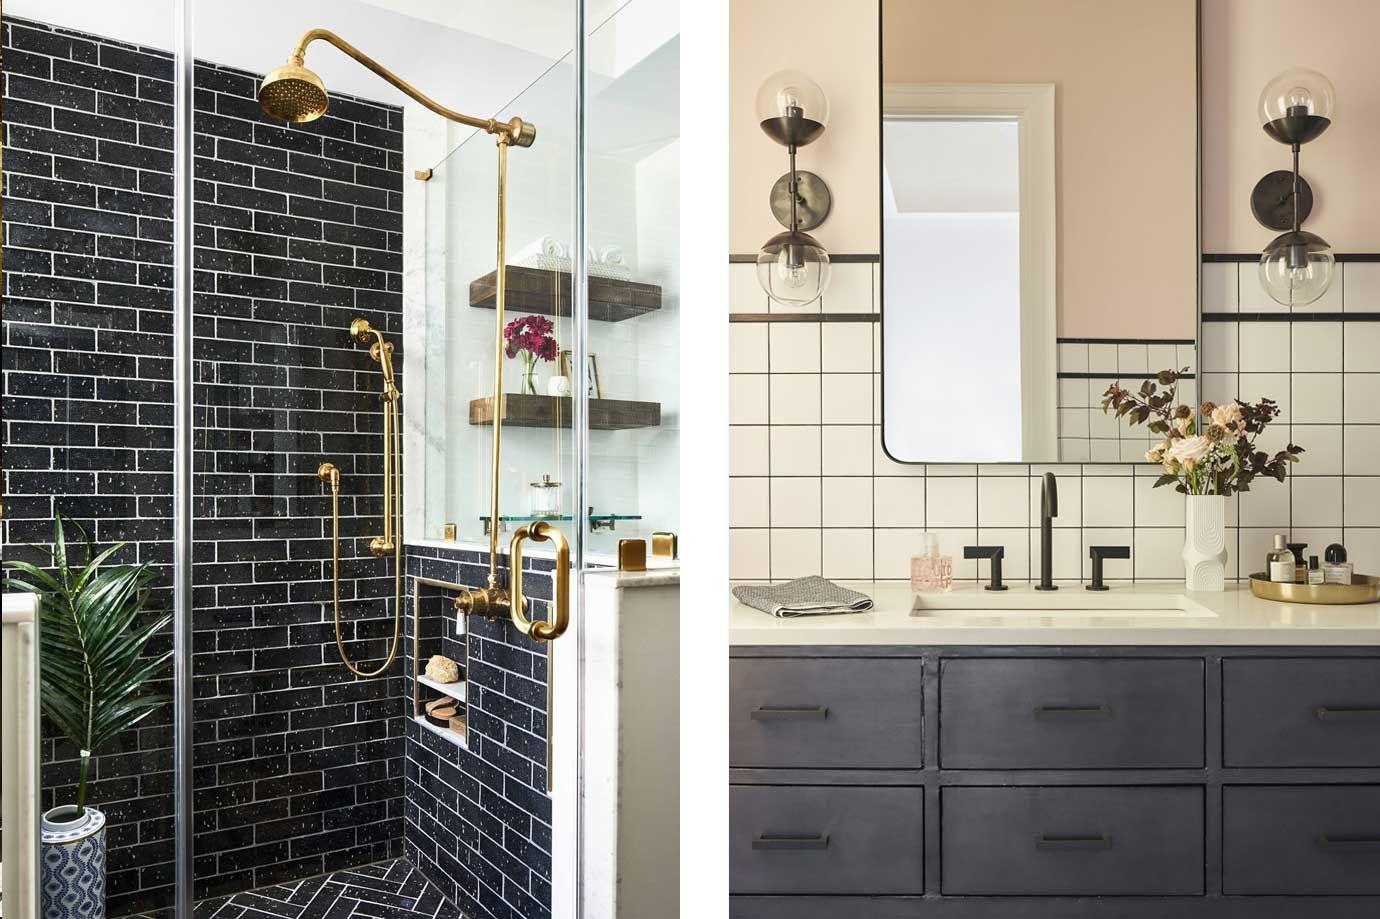 Creative Bathroom Tile Design Ideas Tiles For Floor Showers And Walls In Bathrooms